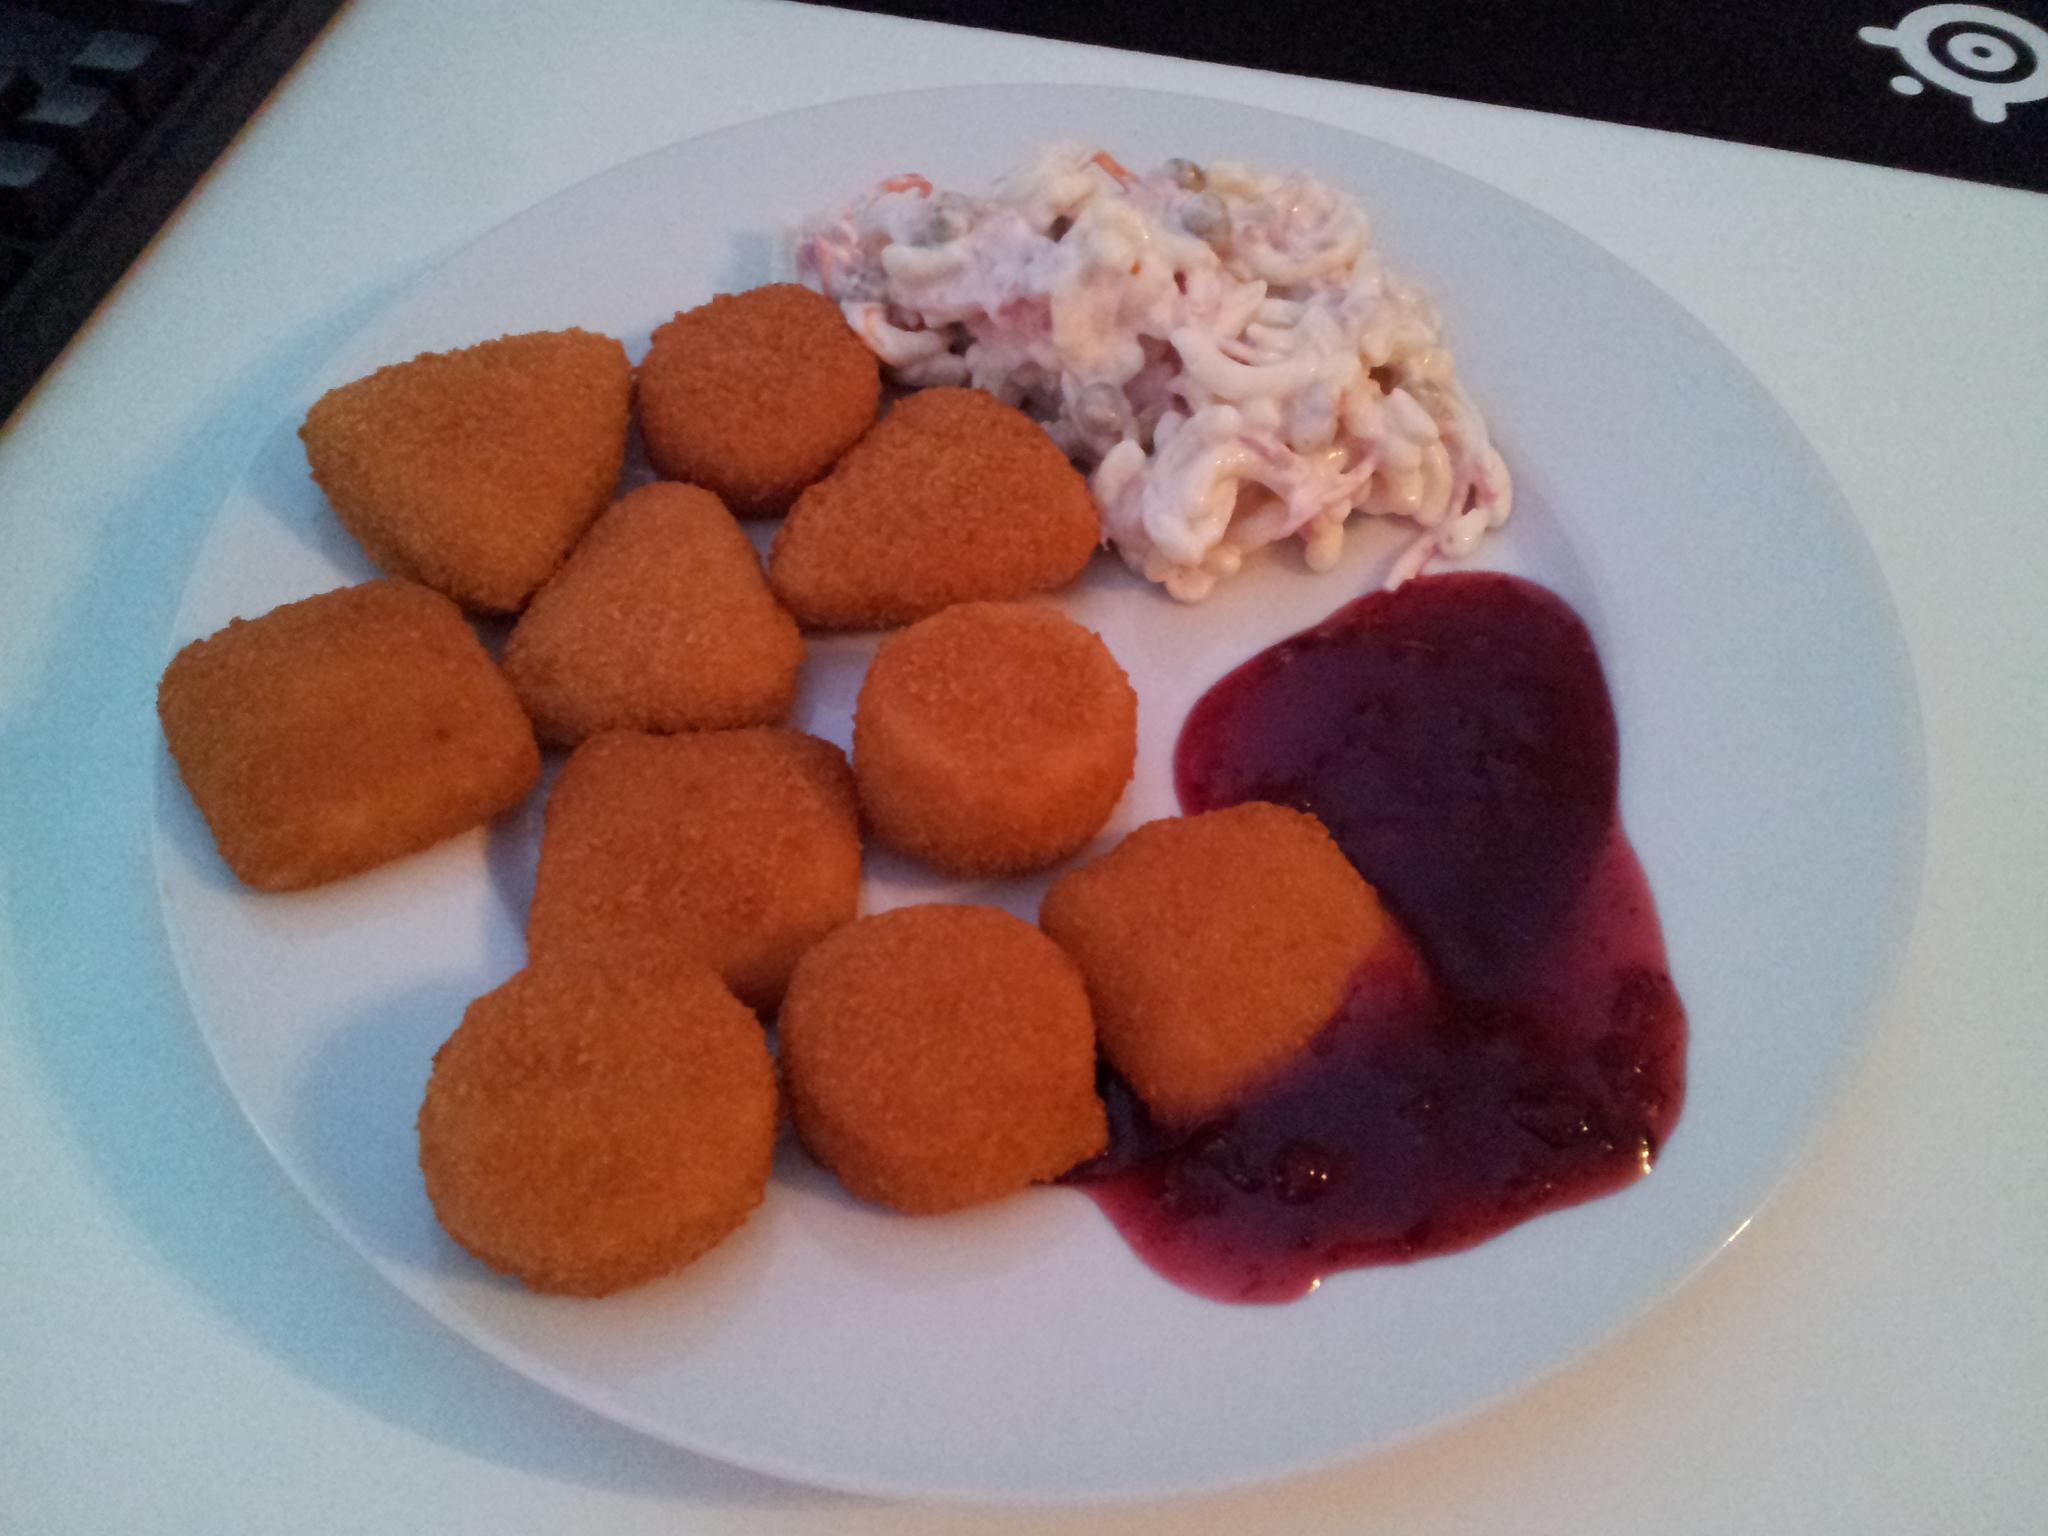 https://foodloader.net/Holz_2014-11-11_Backkaese_und_Nudelsalat.jpg